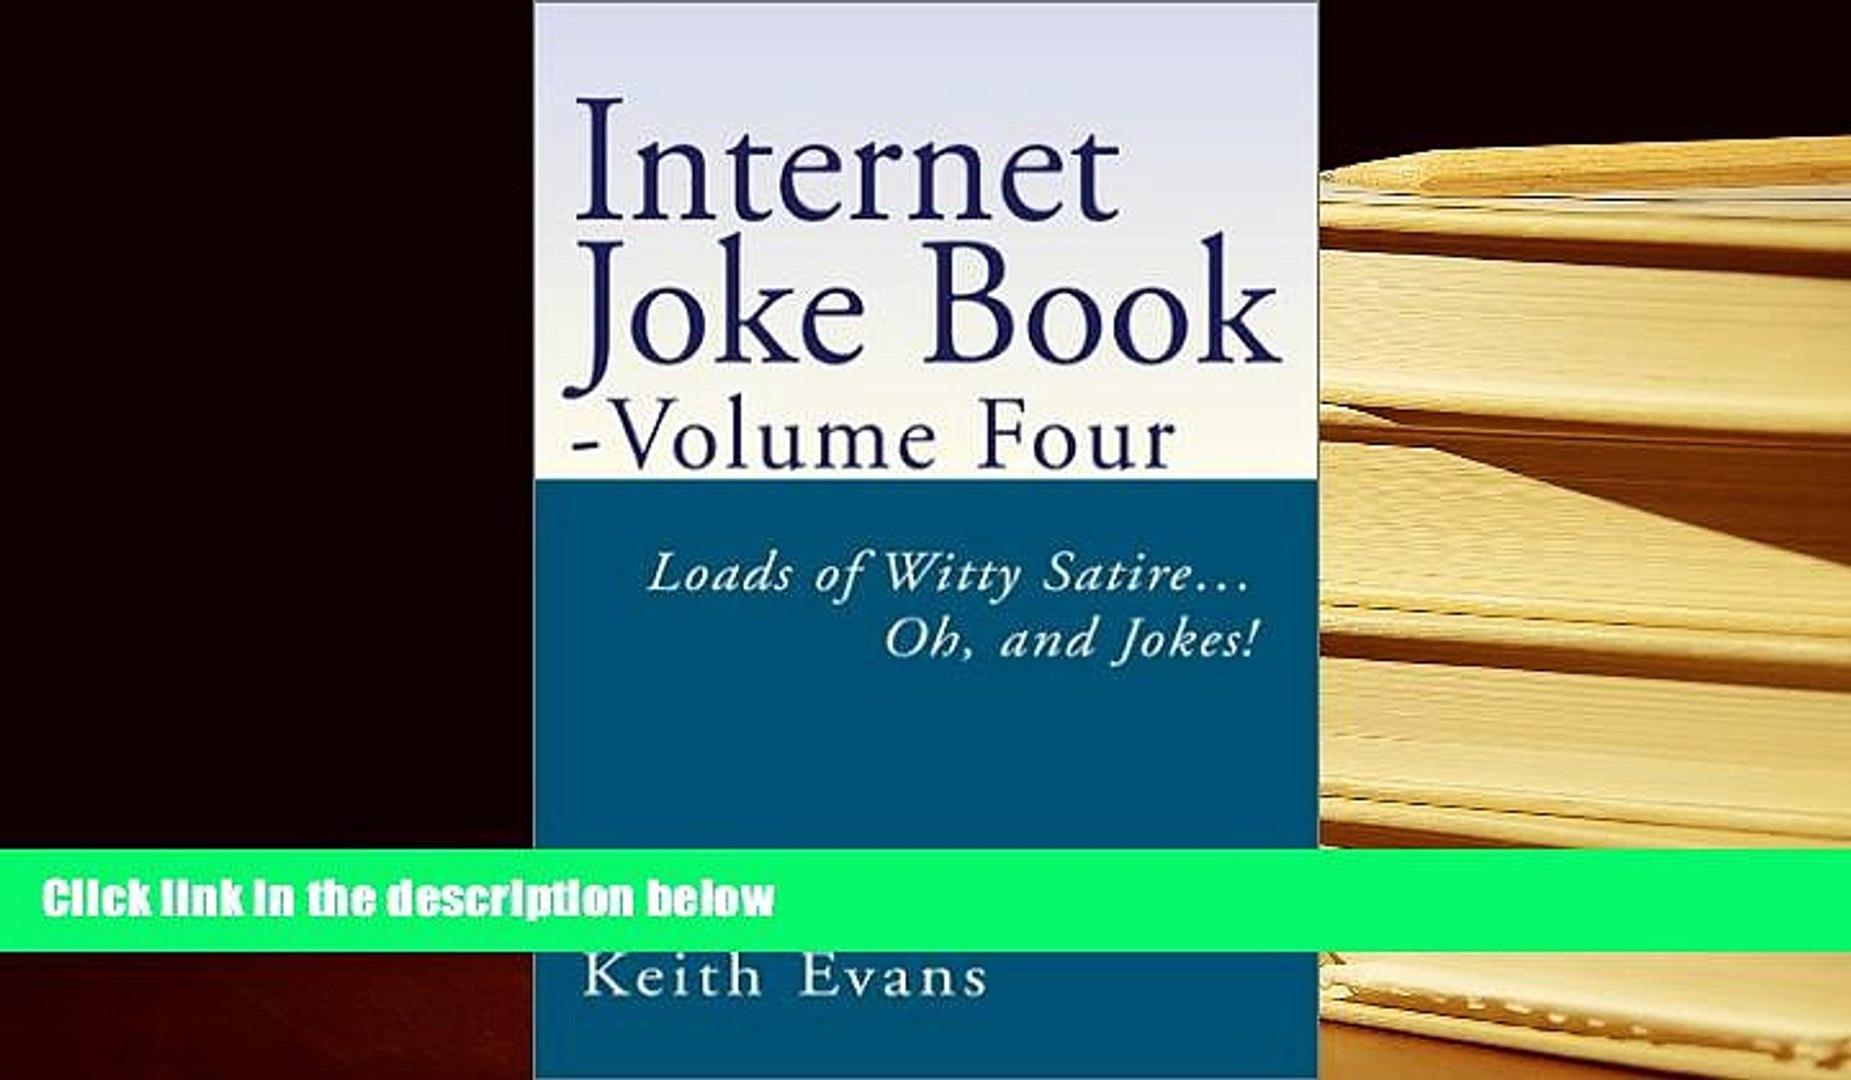 Pdf Internet Joke Book Loads Of Witty Satire Oh And Jokes